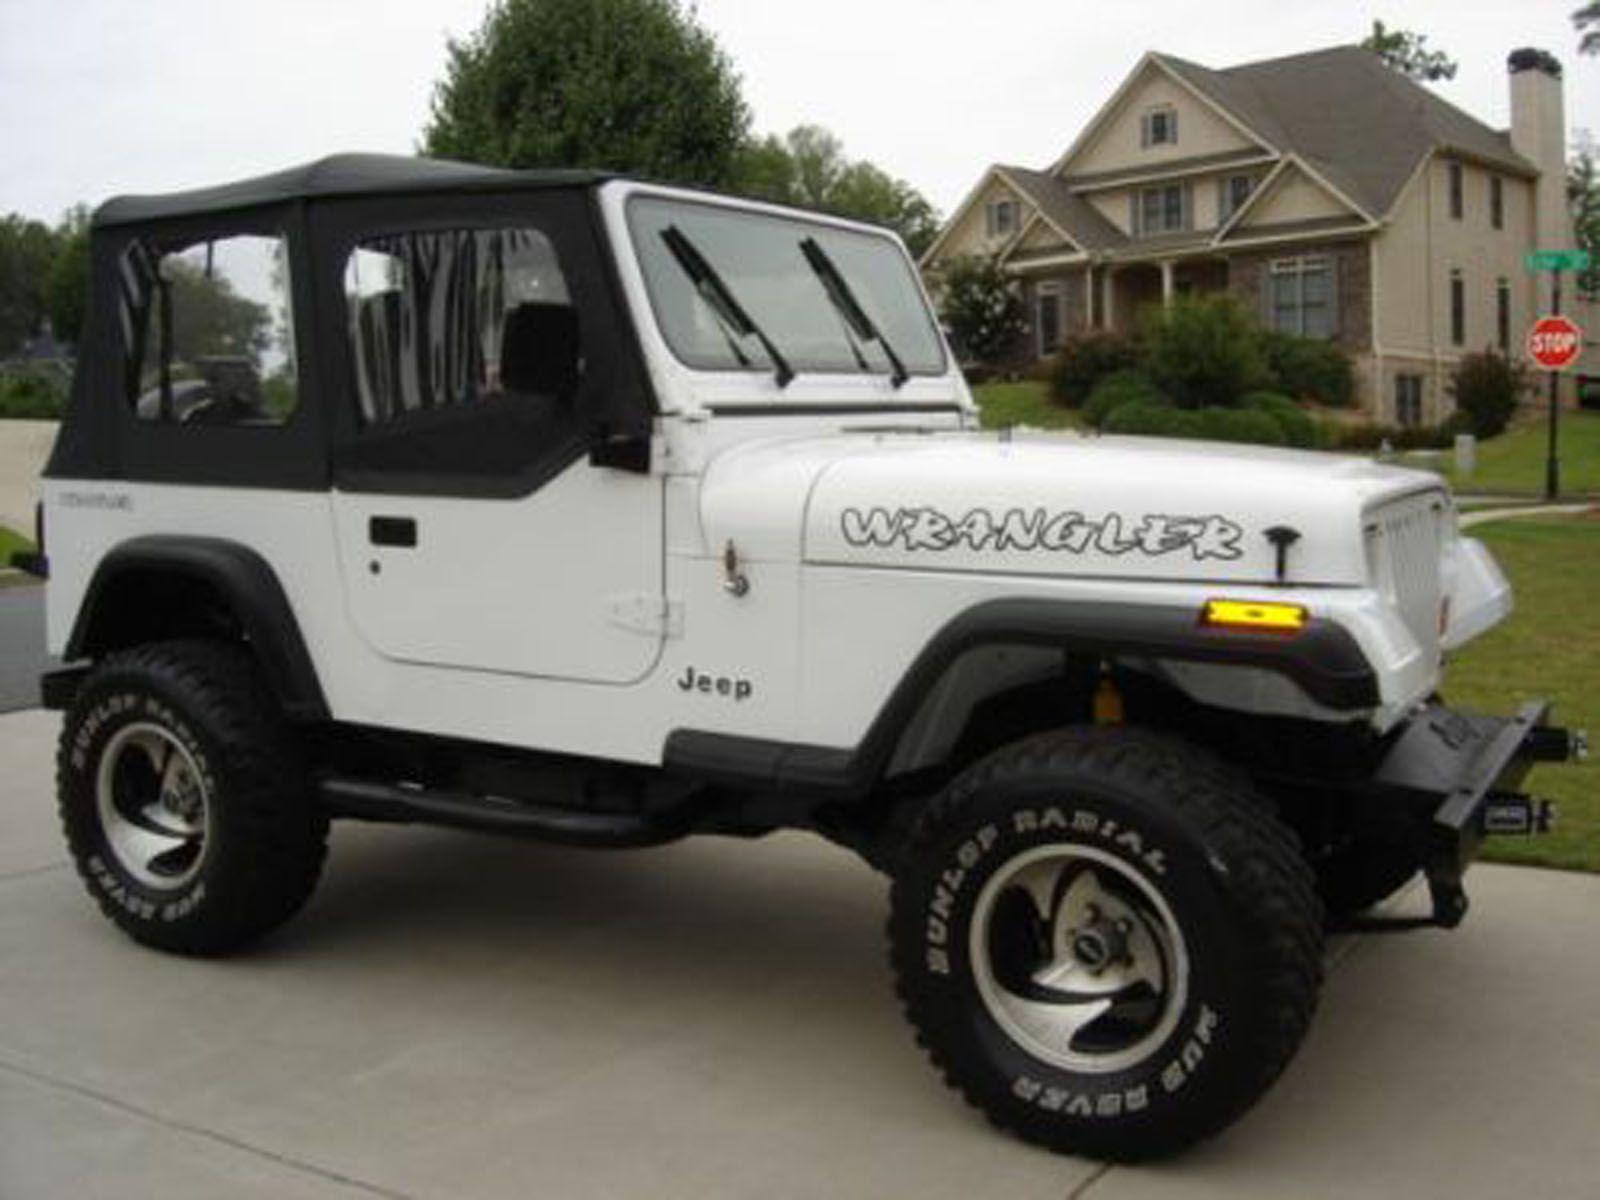 1995 Jeep Wrangler Lifted White Jeep Yj Jeep Wrangler Yj Jeep Wrangler Lifted